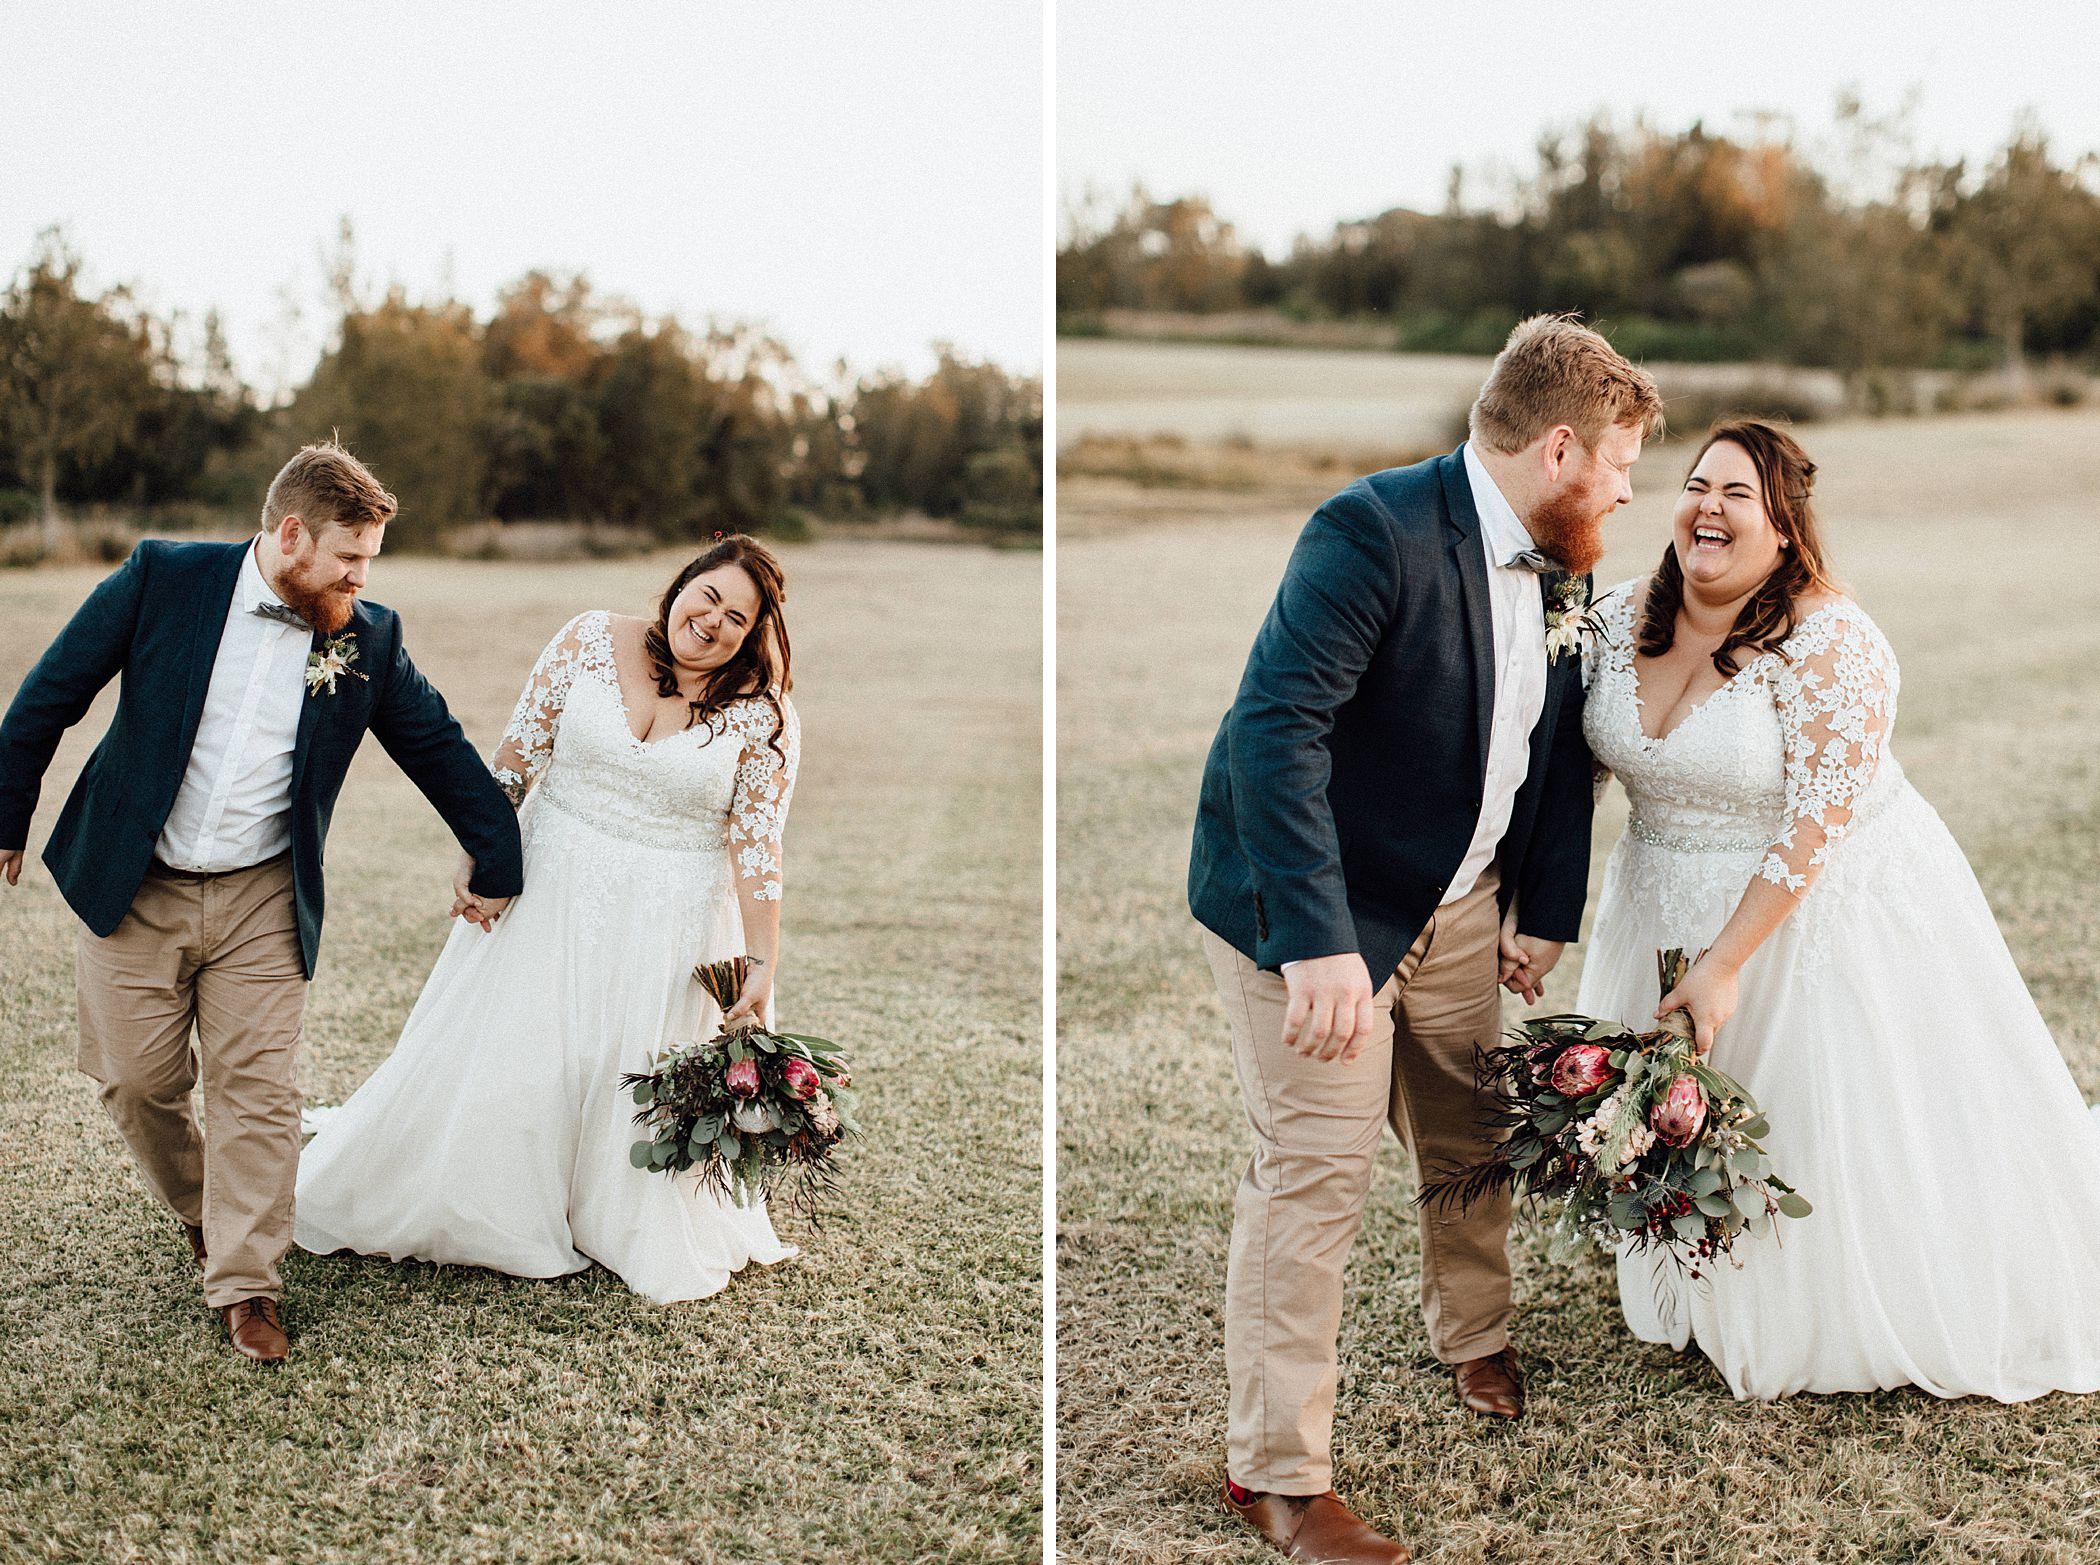 lauren-anne-photography-newcastle-hunter-valley-wedding-photographer_1230.jpg